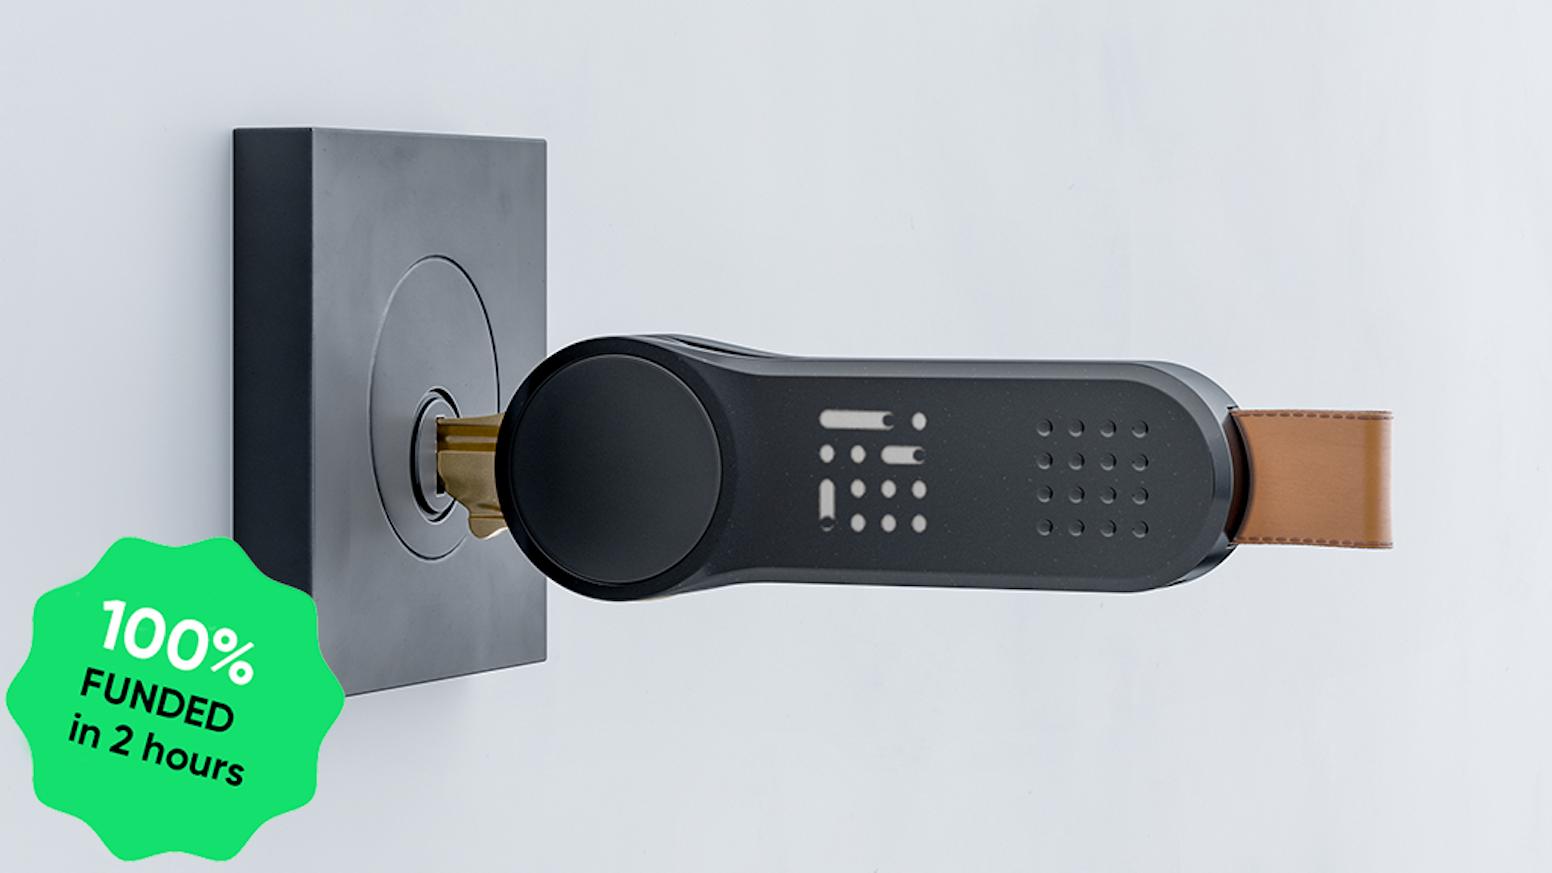 Locky: The First Smart Key Overlay